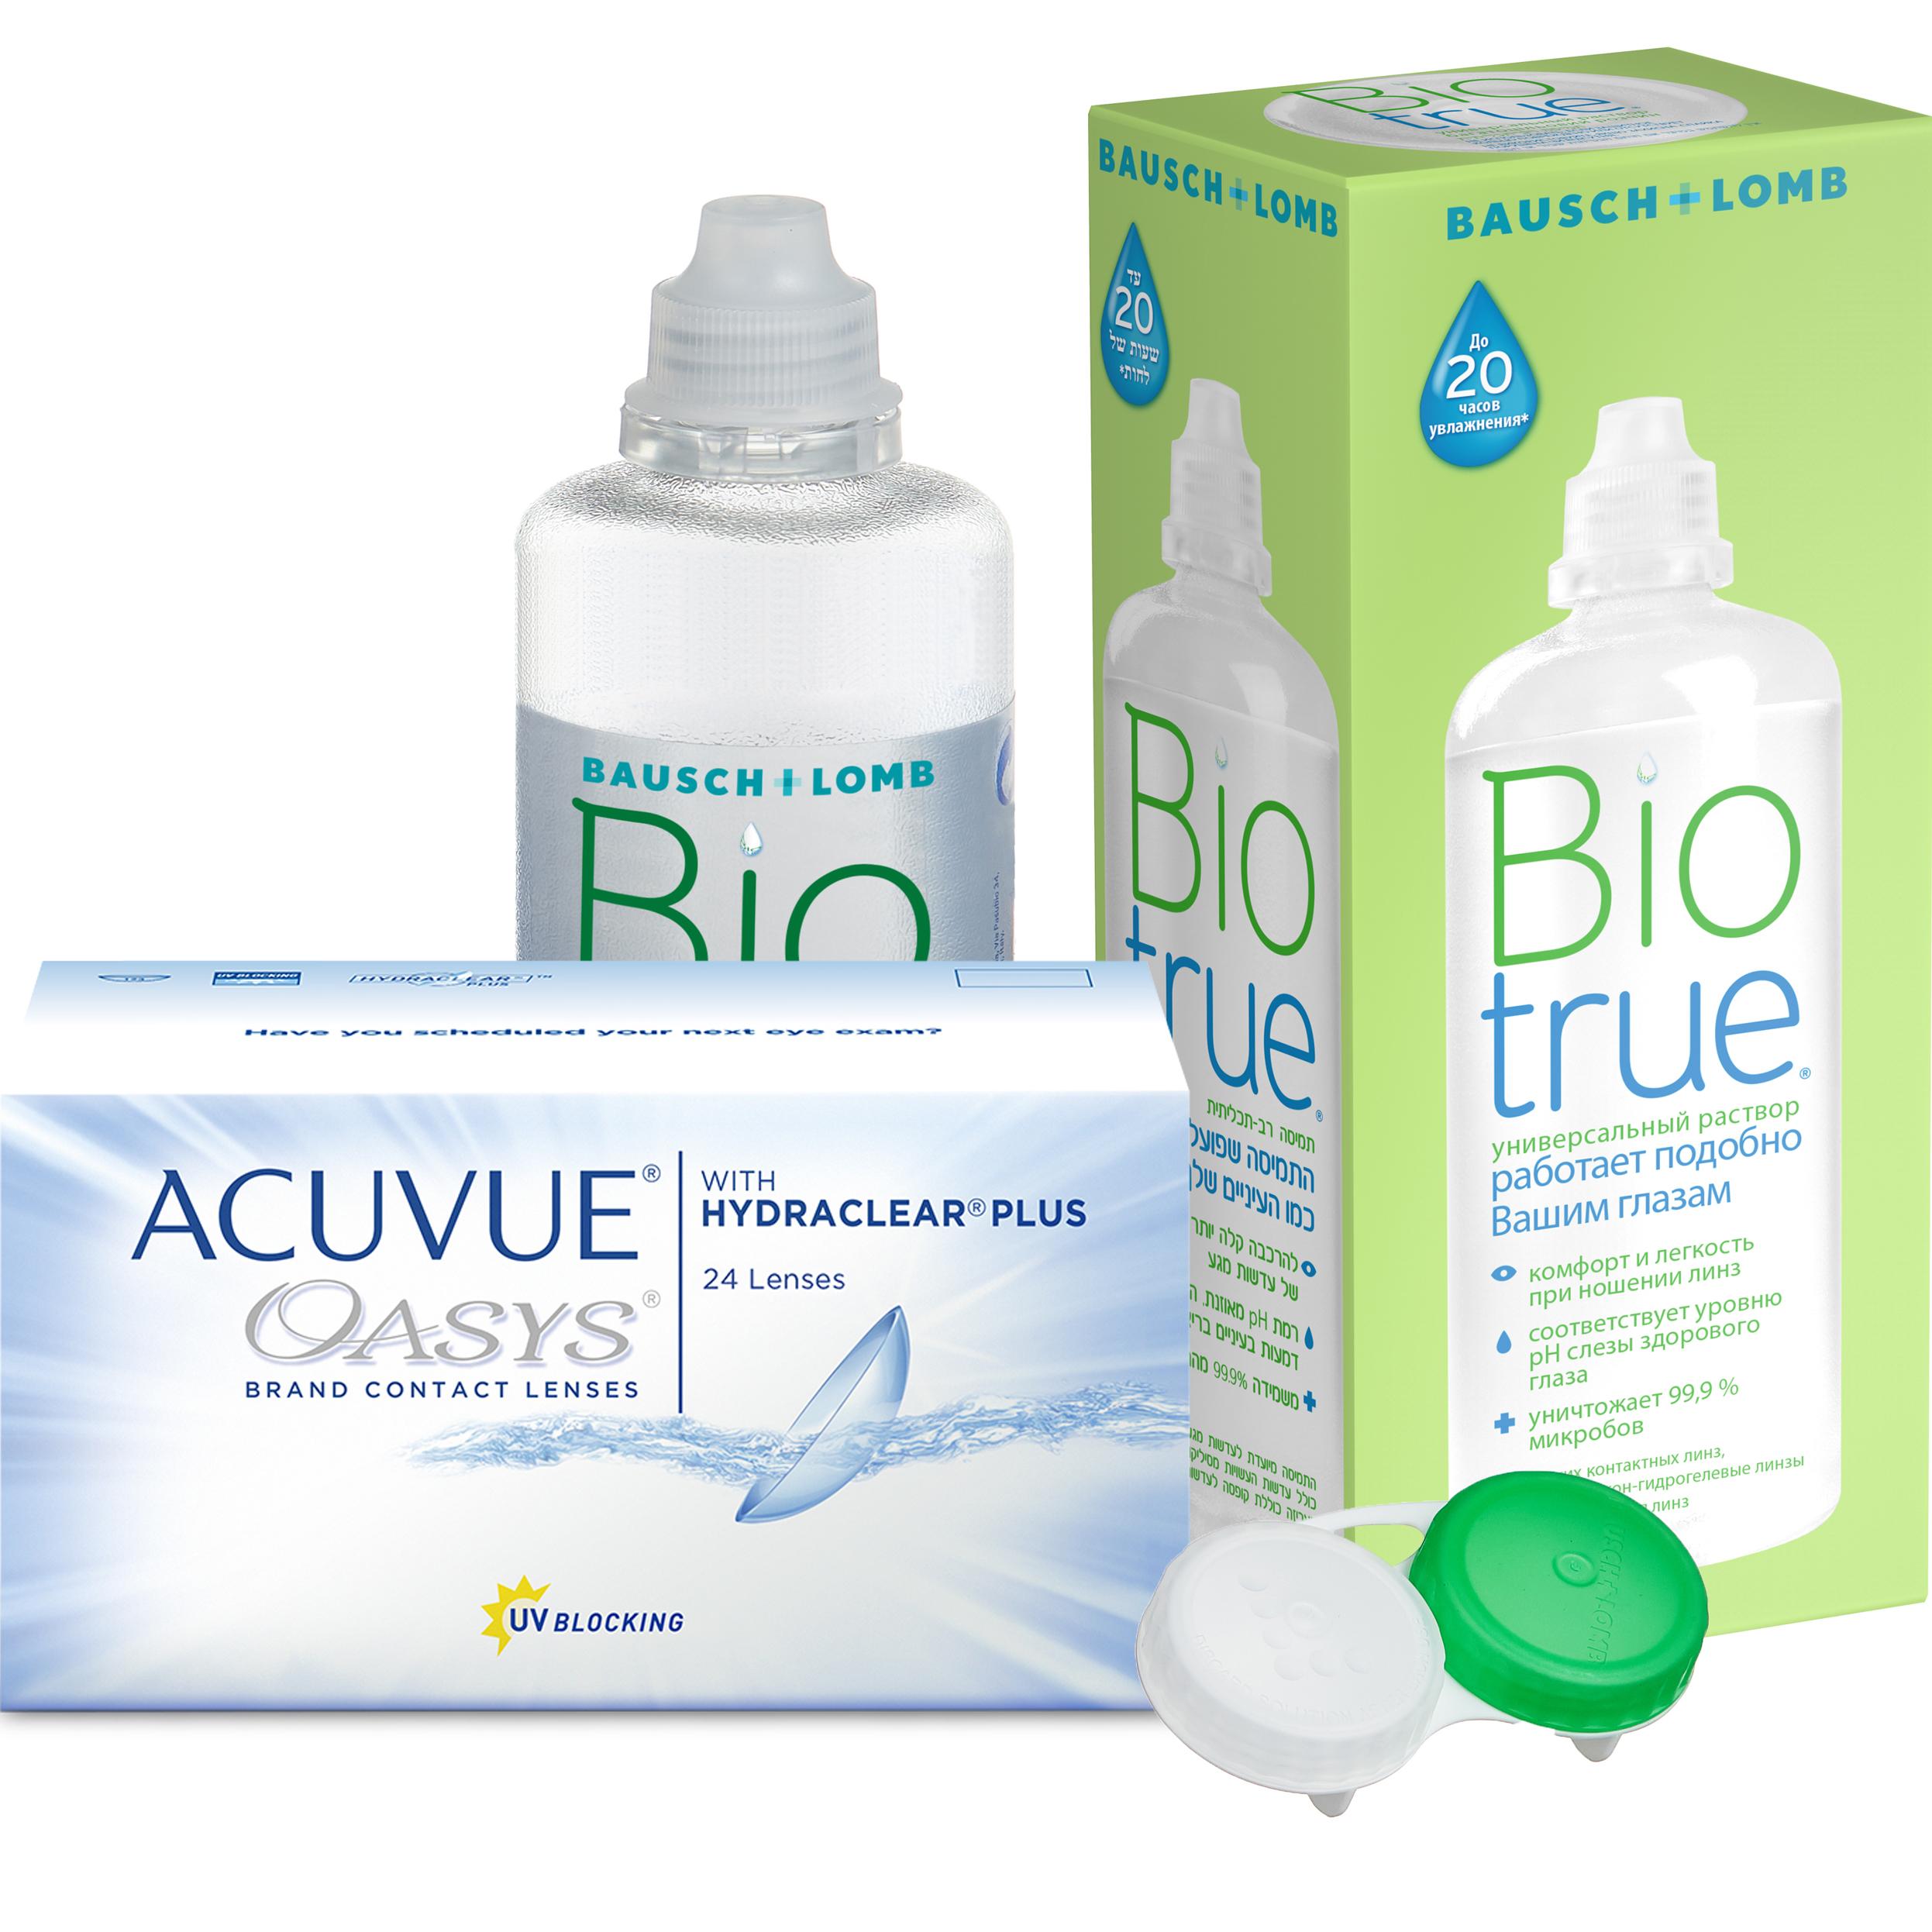 Купить Oasys with Hydraclear Plus 24 линзы + Biotrue, Контактные линзы Acuvue Oasys with Hydraclear Plus 24 линзы R 8.4 +2, 75 + Biotrue 300 мл